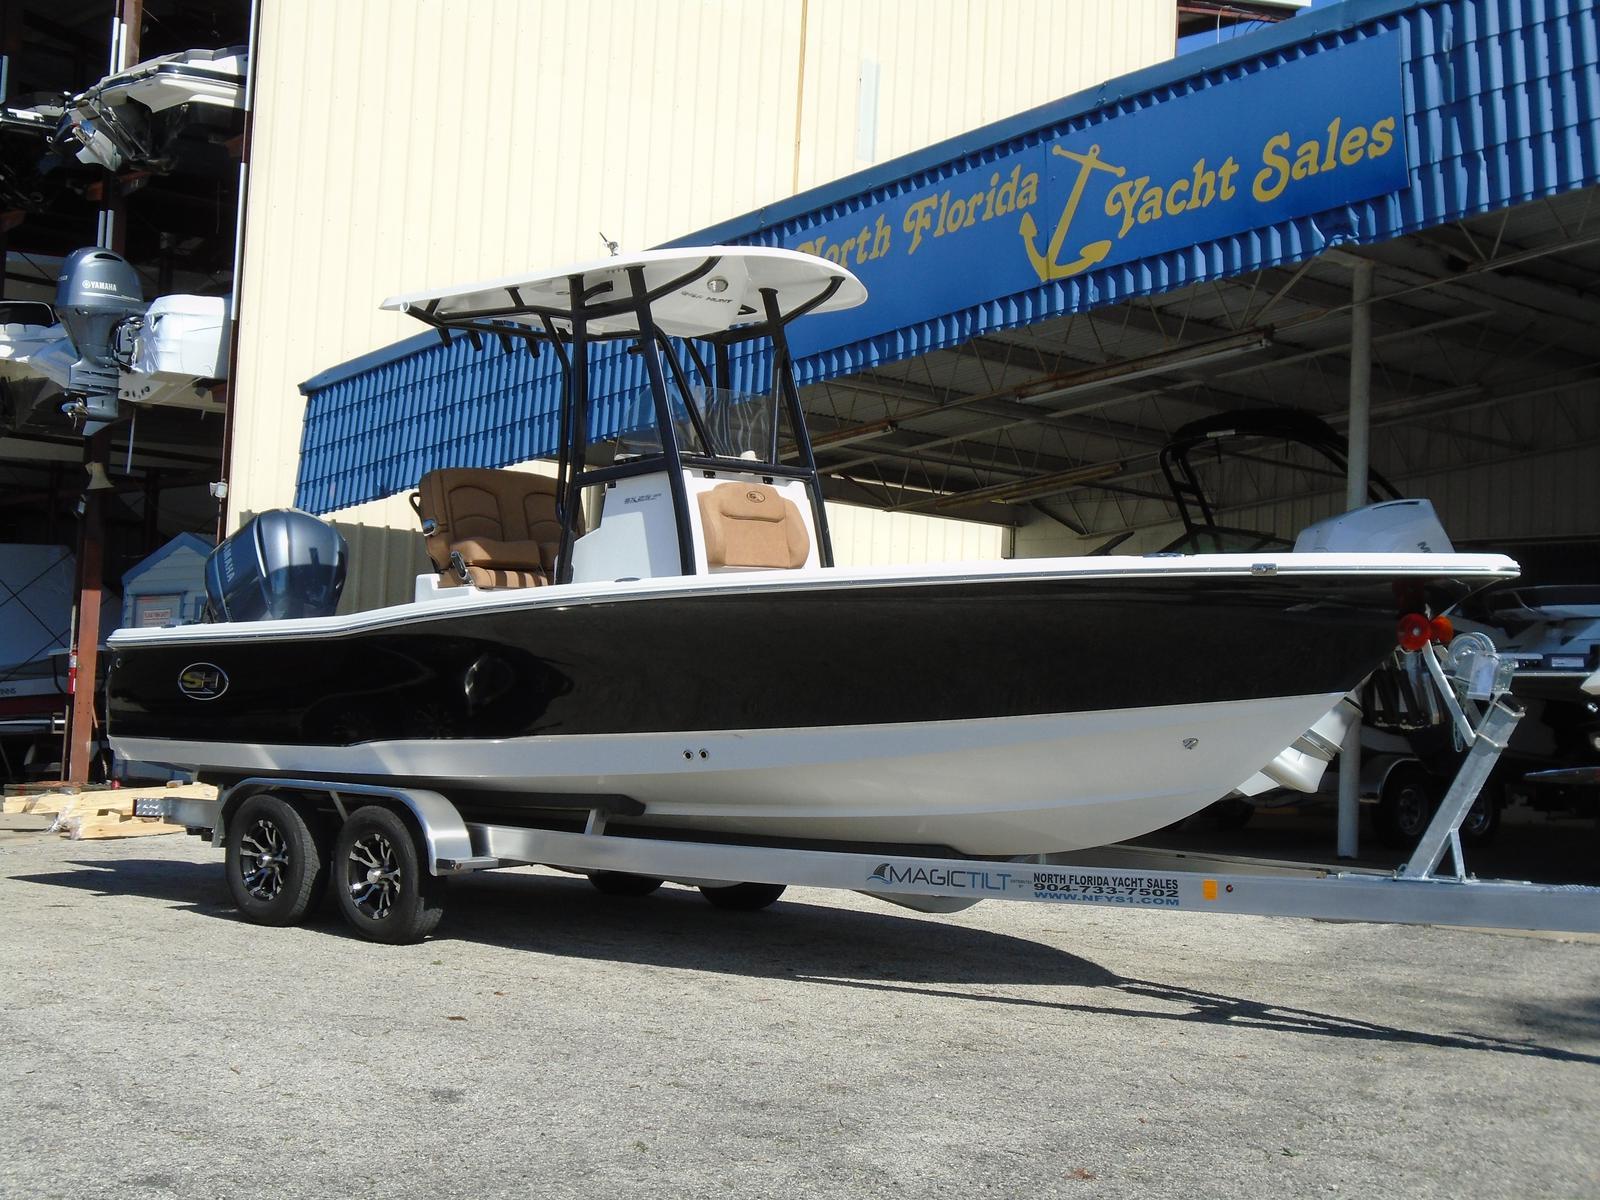 Inventory North Florida Yacht Sales Jacksonville, FL (904) 733-7502